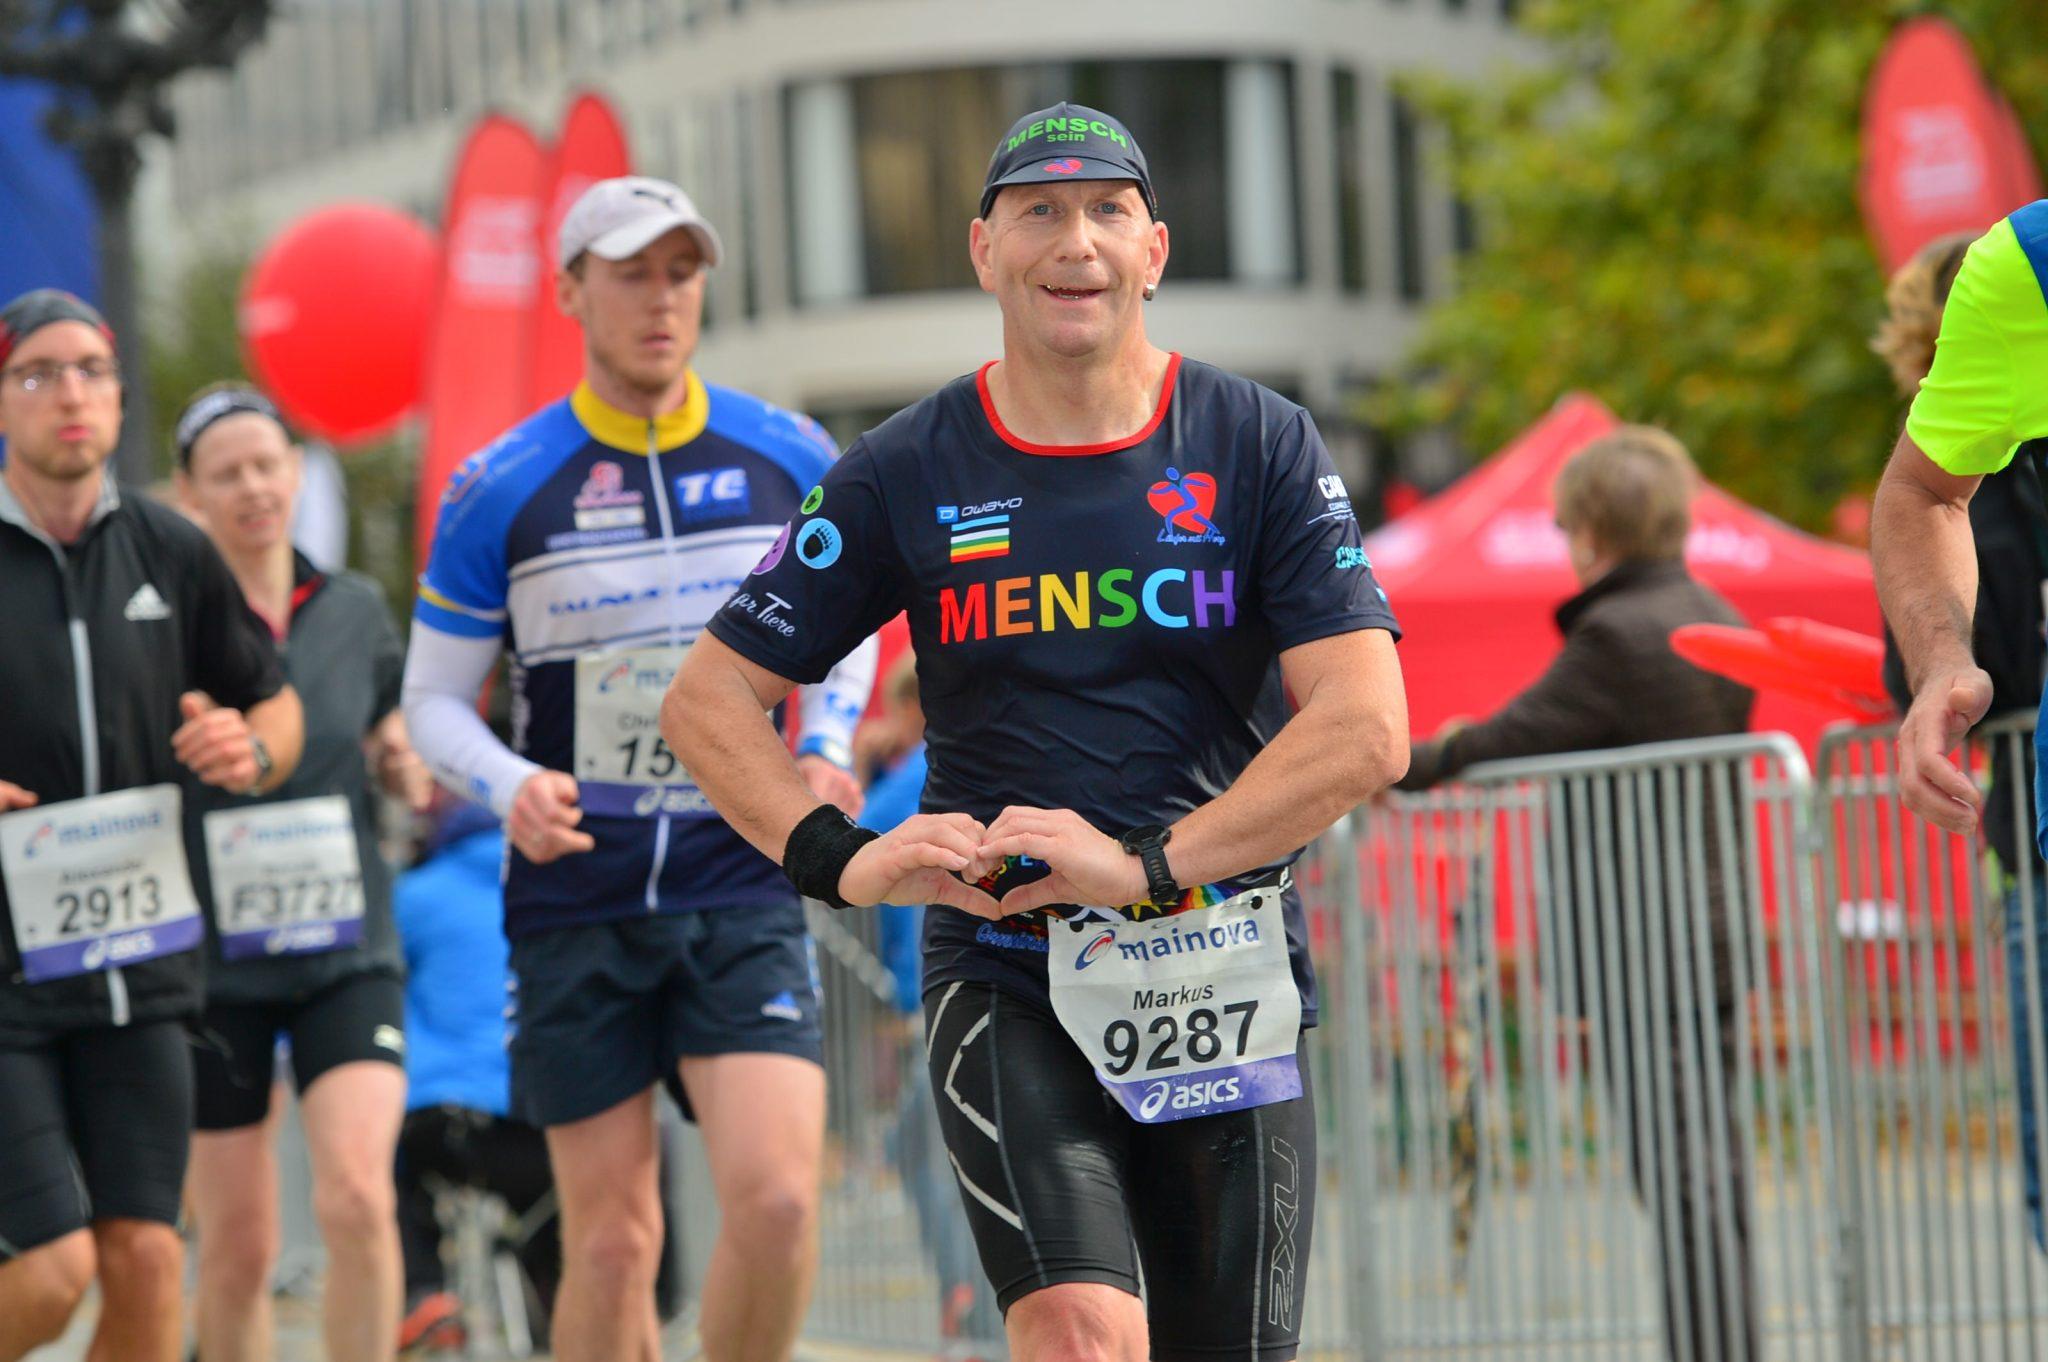 Markus Rajzer - Frankfurt Marathon